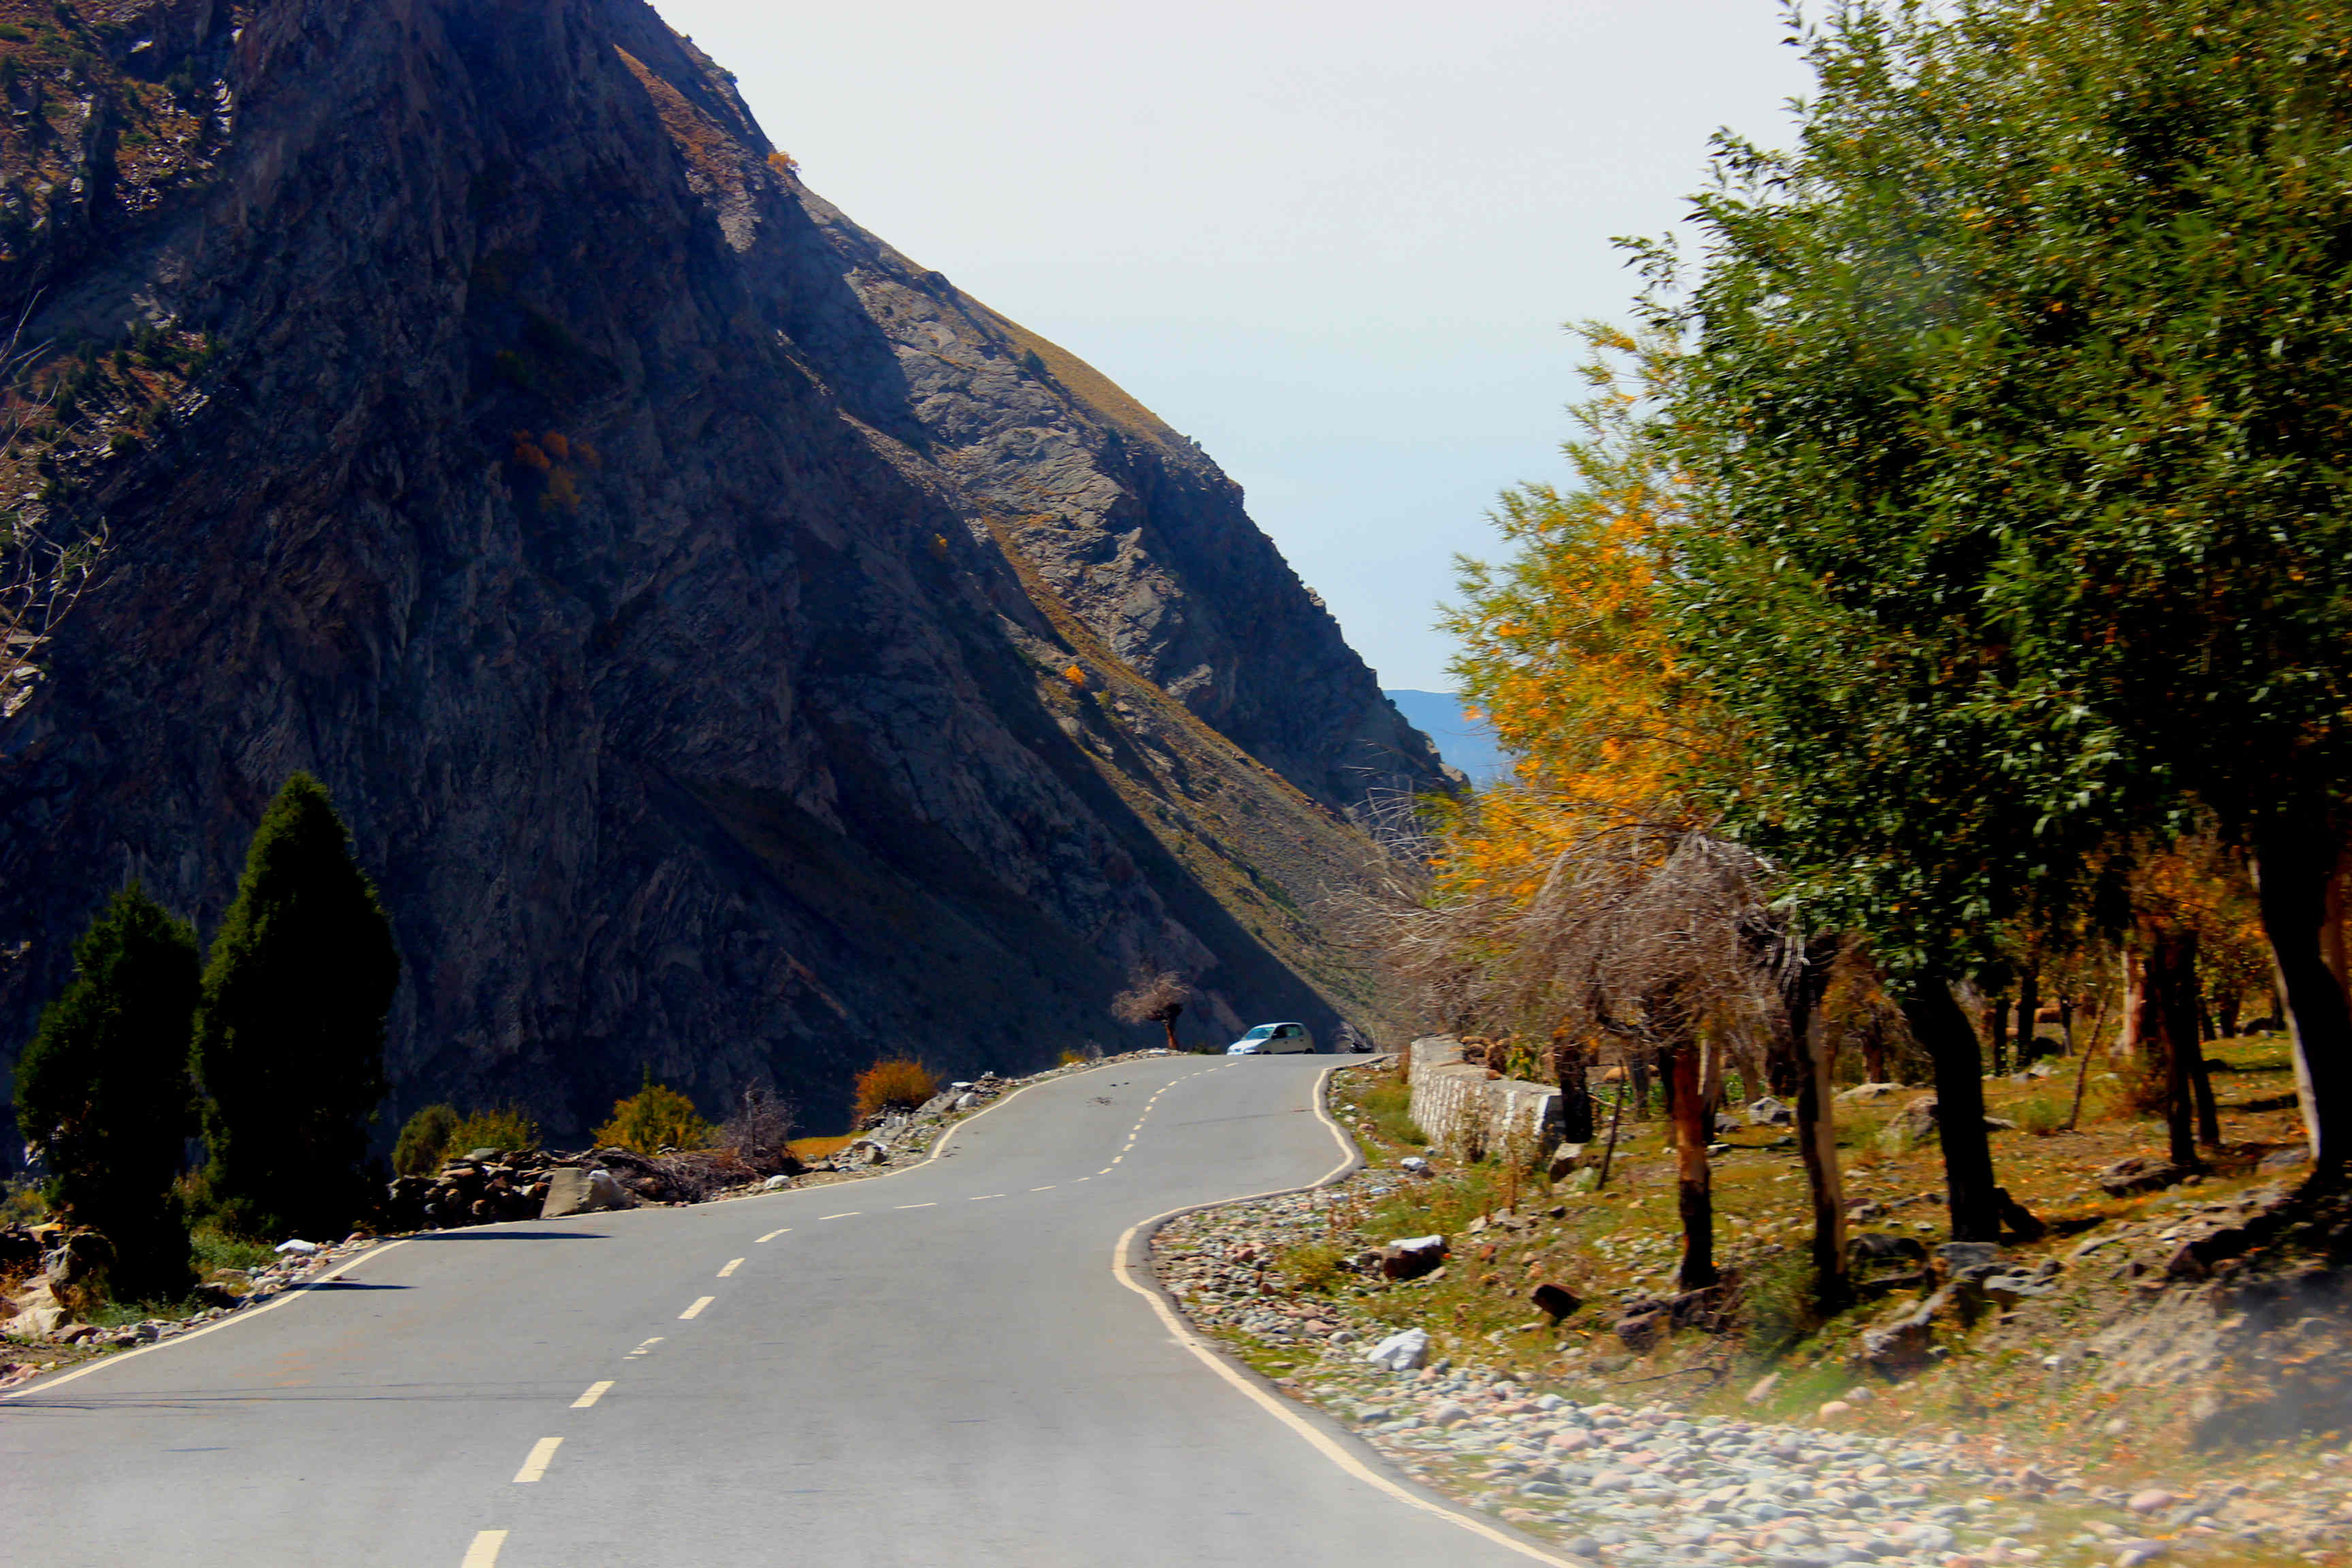 Jispa Village